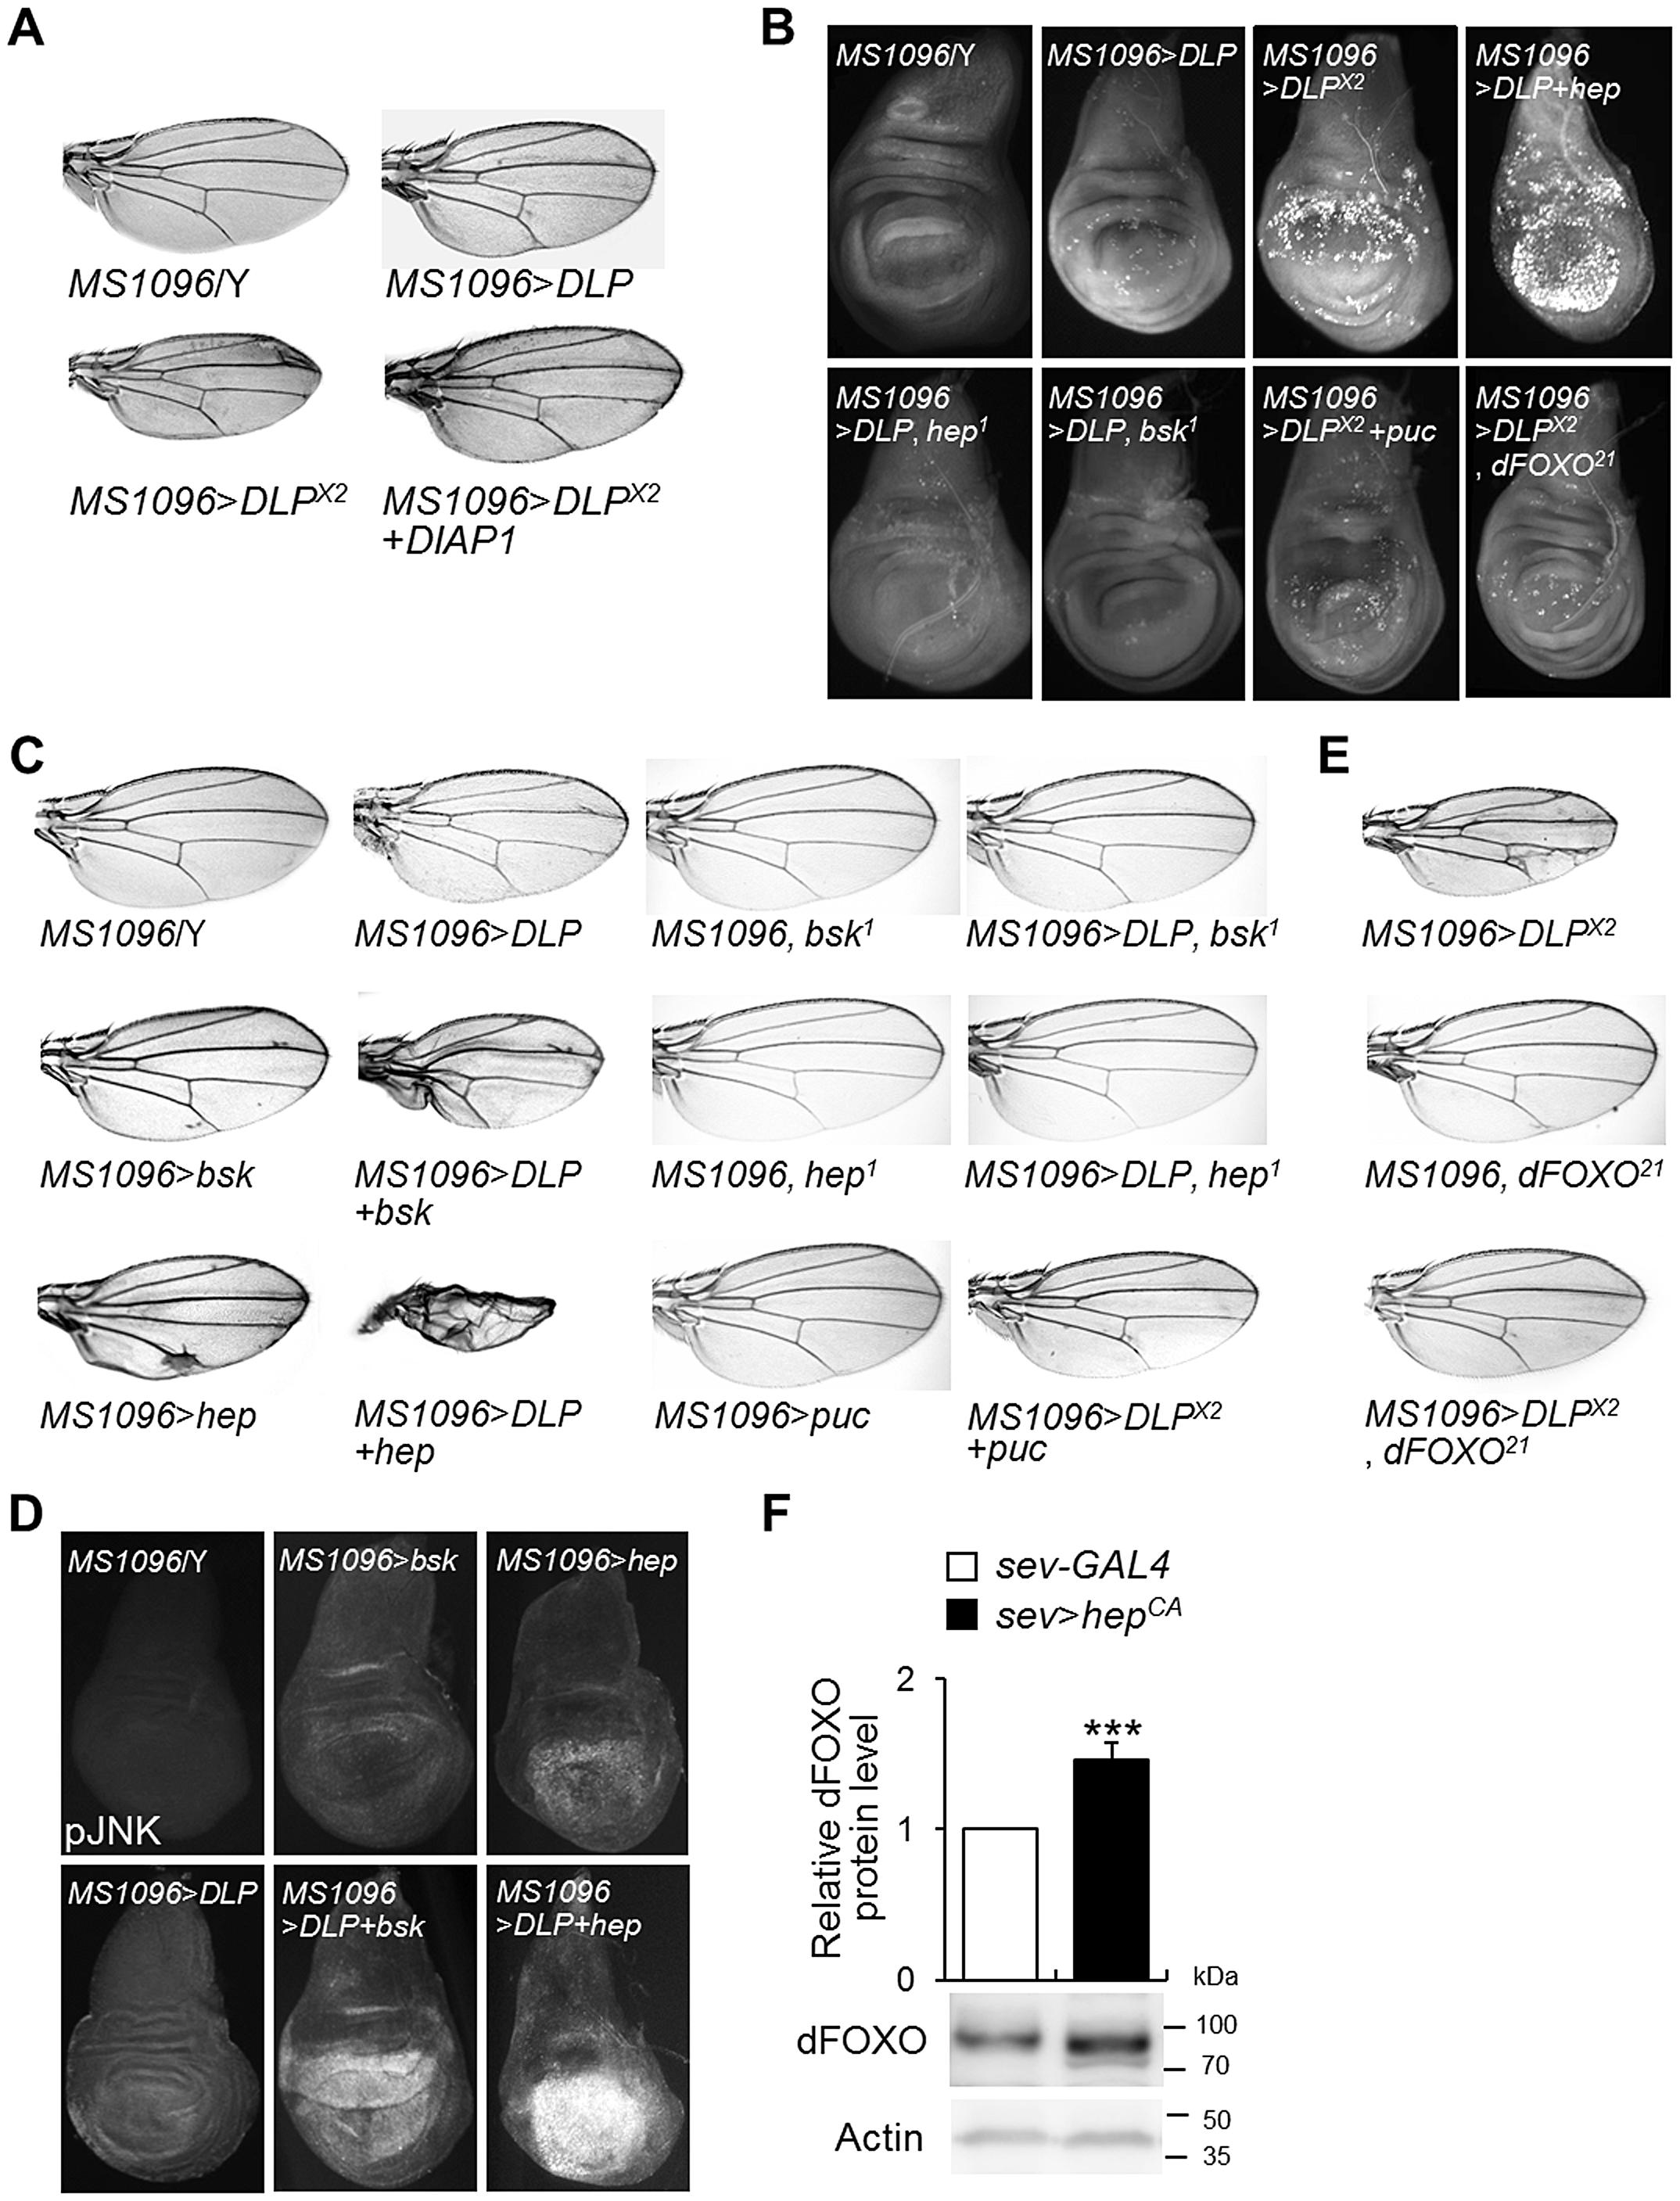 DLP activates apoptosis and the JNK/dFOXO signaling pathway.